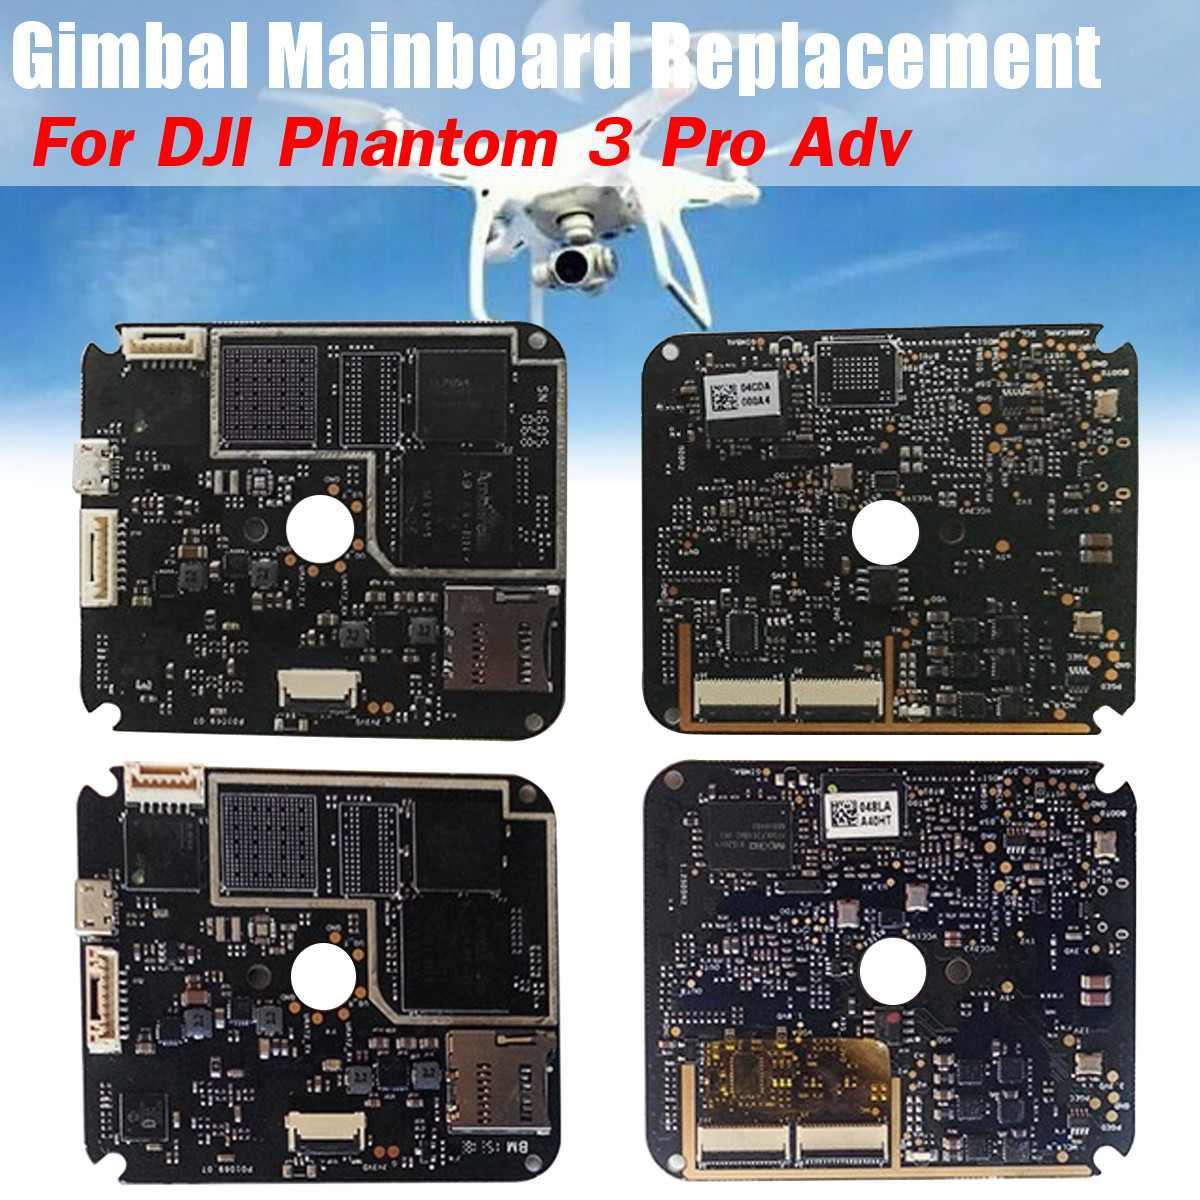 repair-parts-gimbal-camera-forward-sensor-control-board-mainboard-for-font-b-dji-b-font-font-b-phantom-b-font-3-adv-for-font-b-dji-b-font-font-b-phantom-b-font-3-pro-drone-replacement